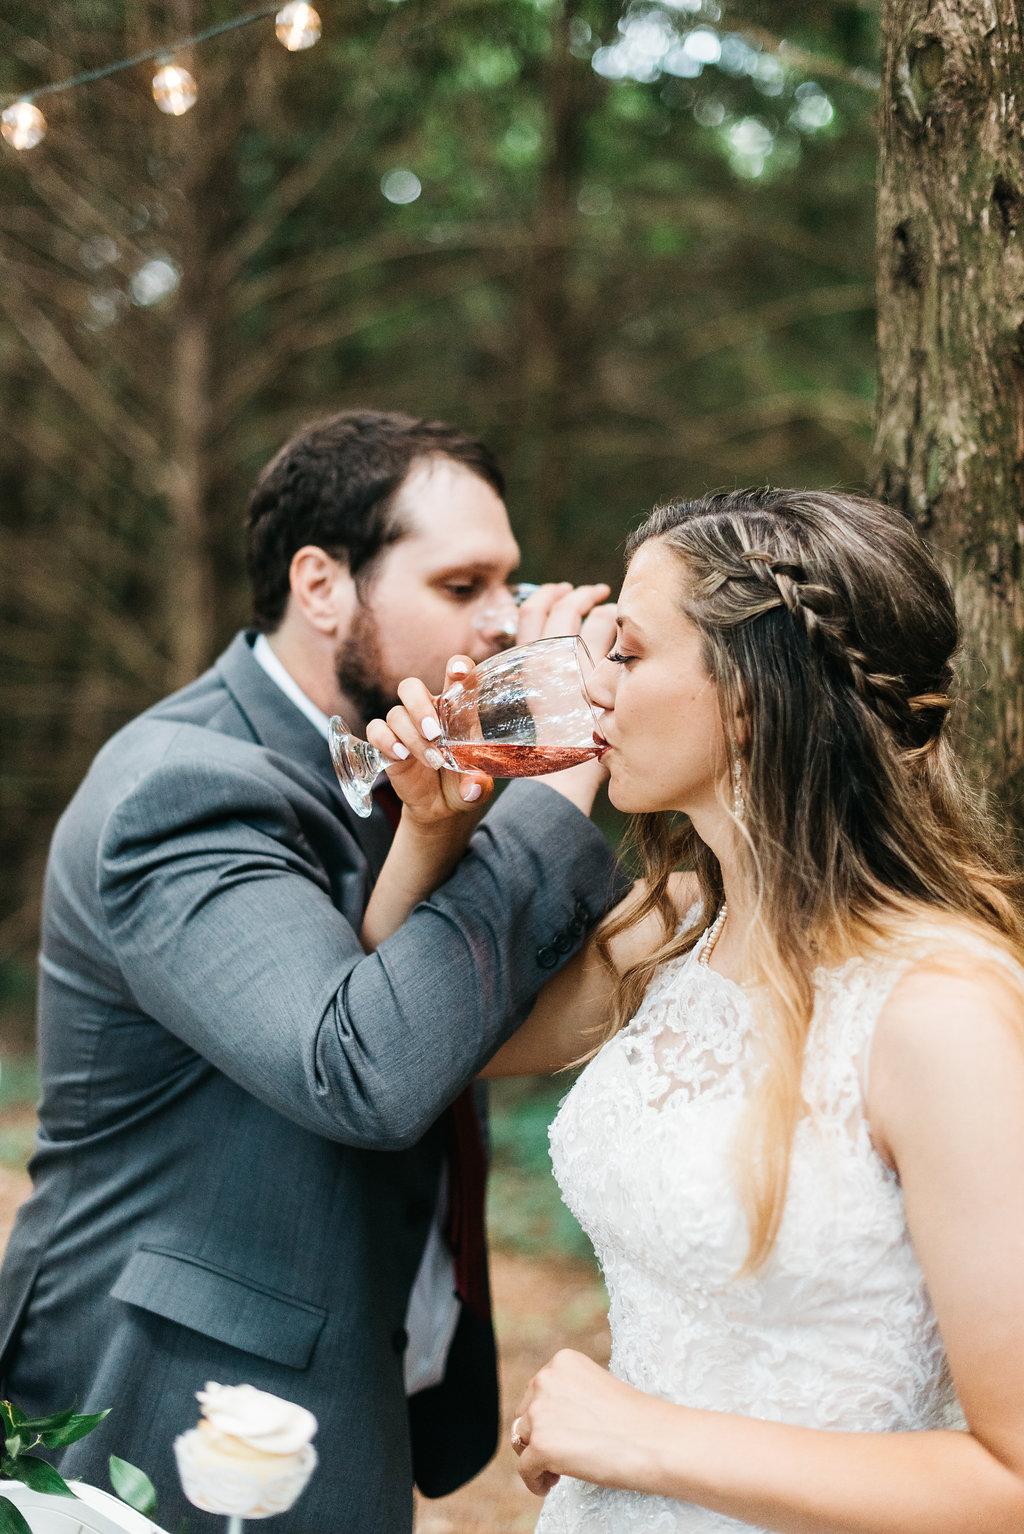 Lexi-Colby-Wedding-2825.jpg